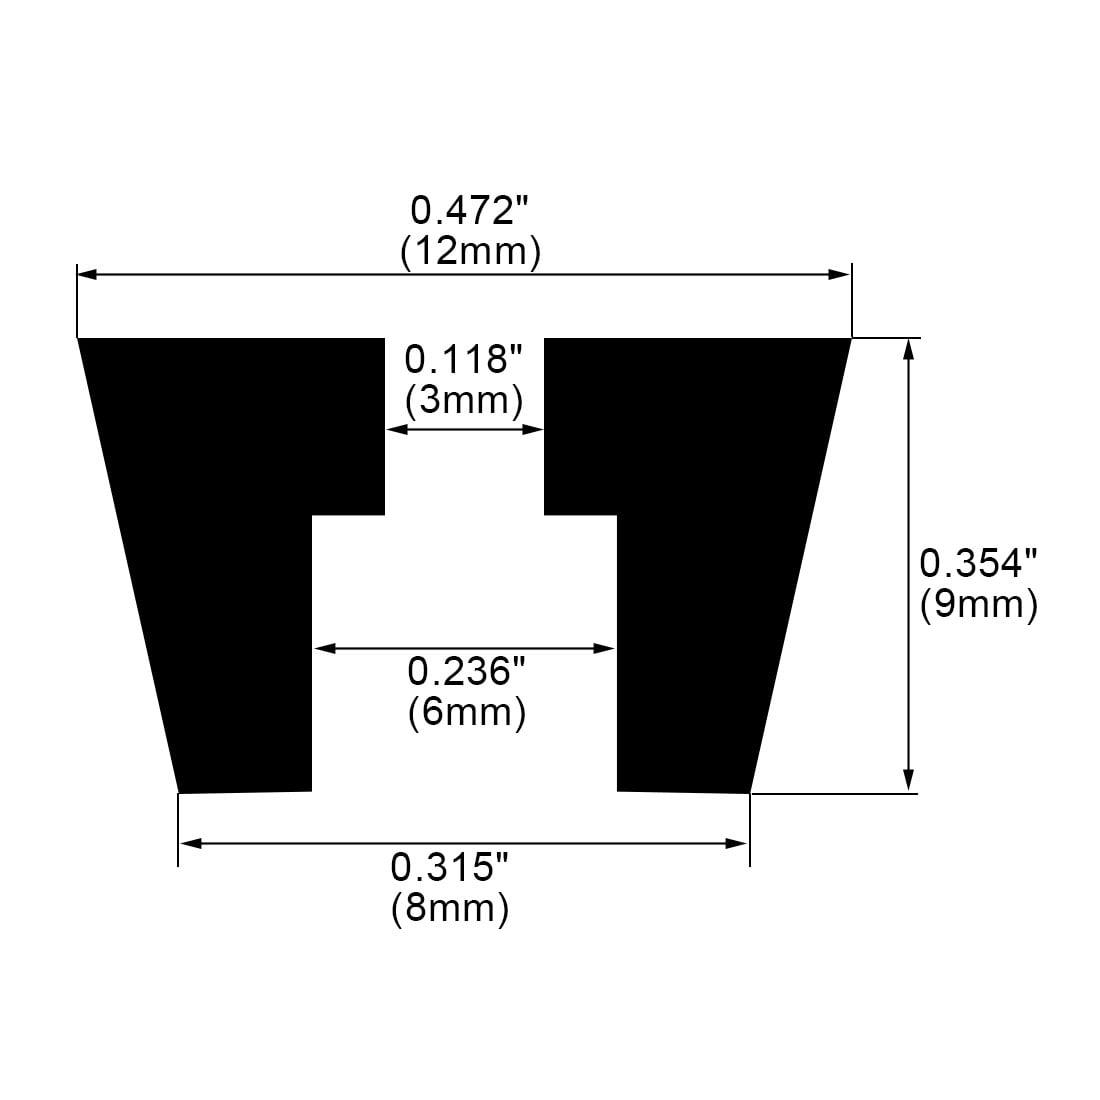 15pcs Rubber Feet Bumper Buffer Amplifier Speaker with Metal Washer, D12x8xH9mm - image 6 of 7